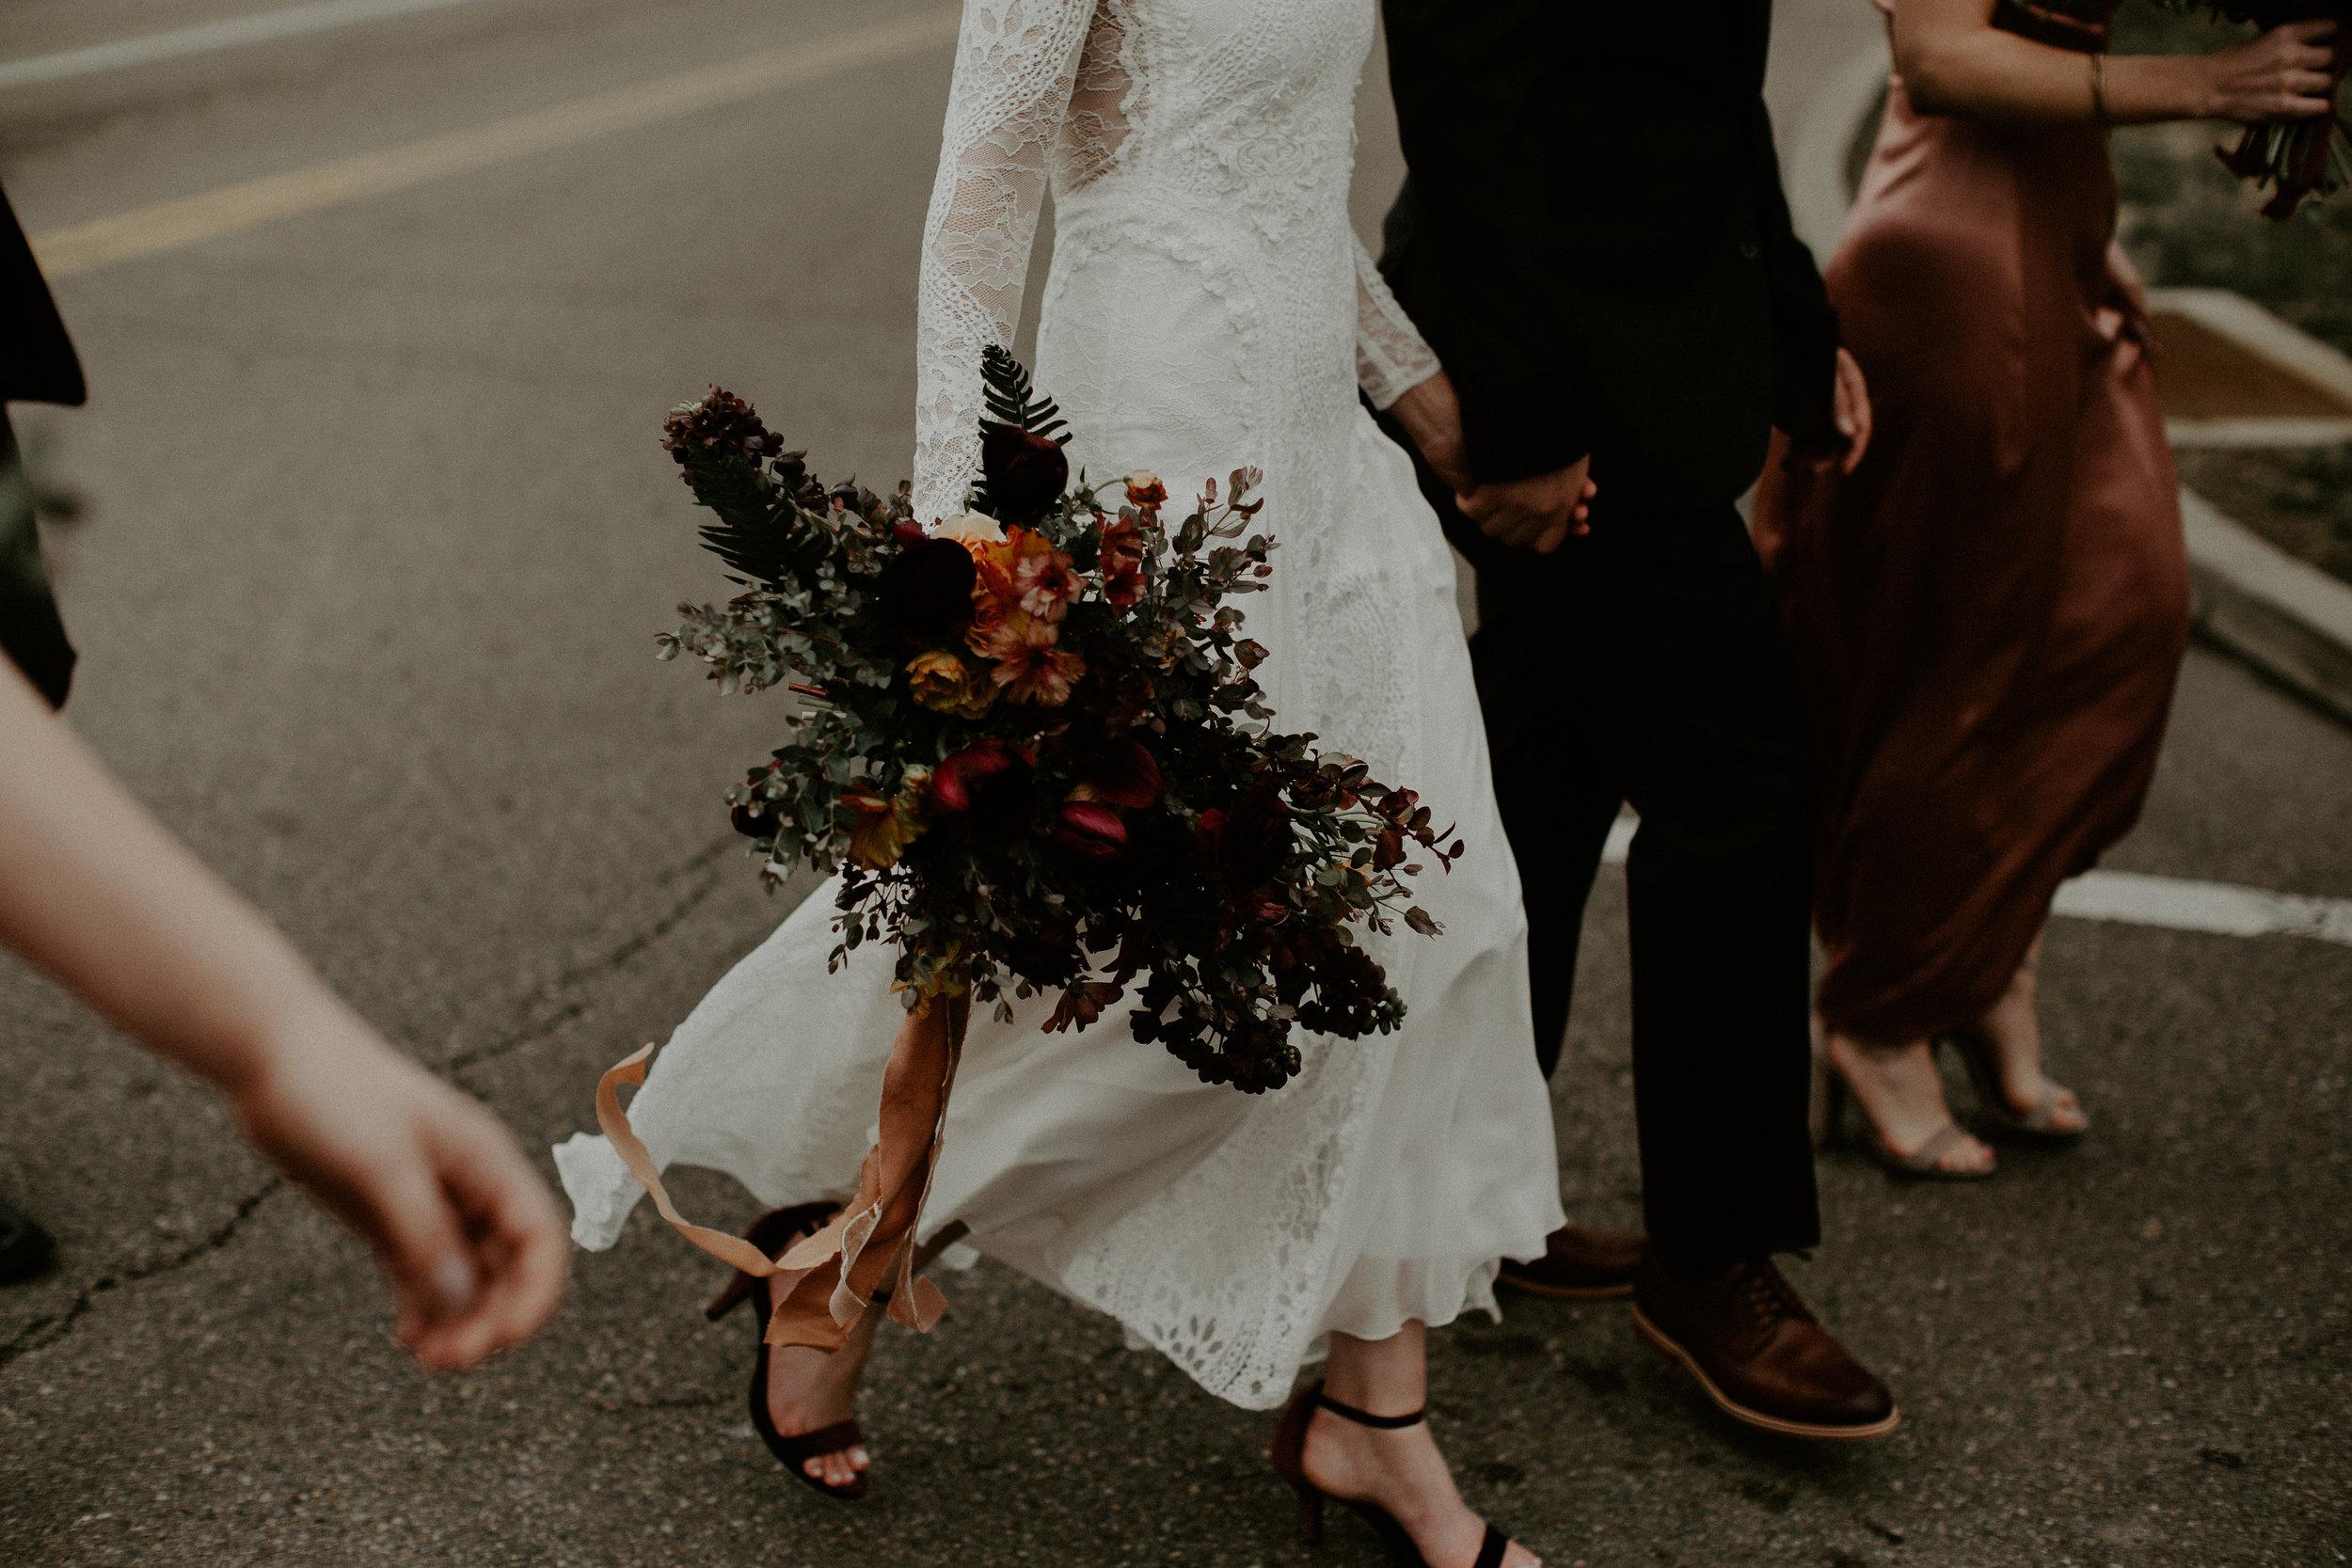 The_Steam_Plant_Dayton_Wedding-EDIT-242.jpg